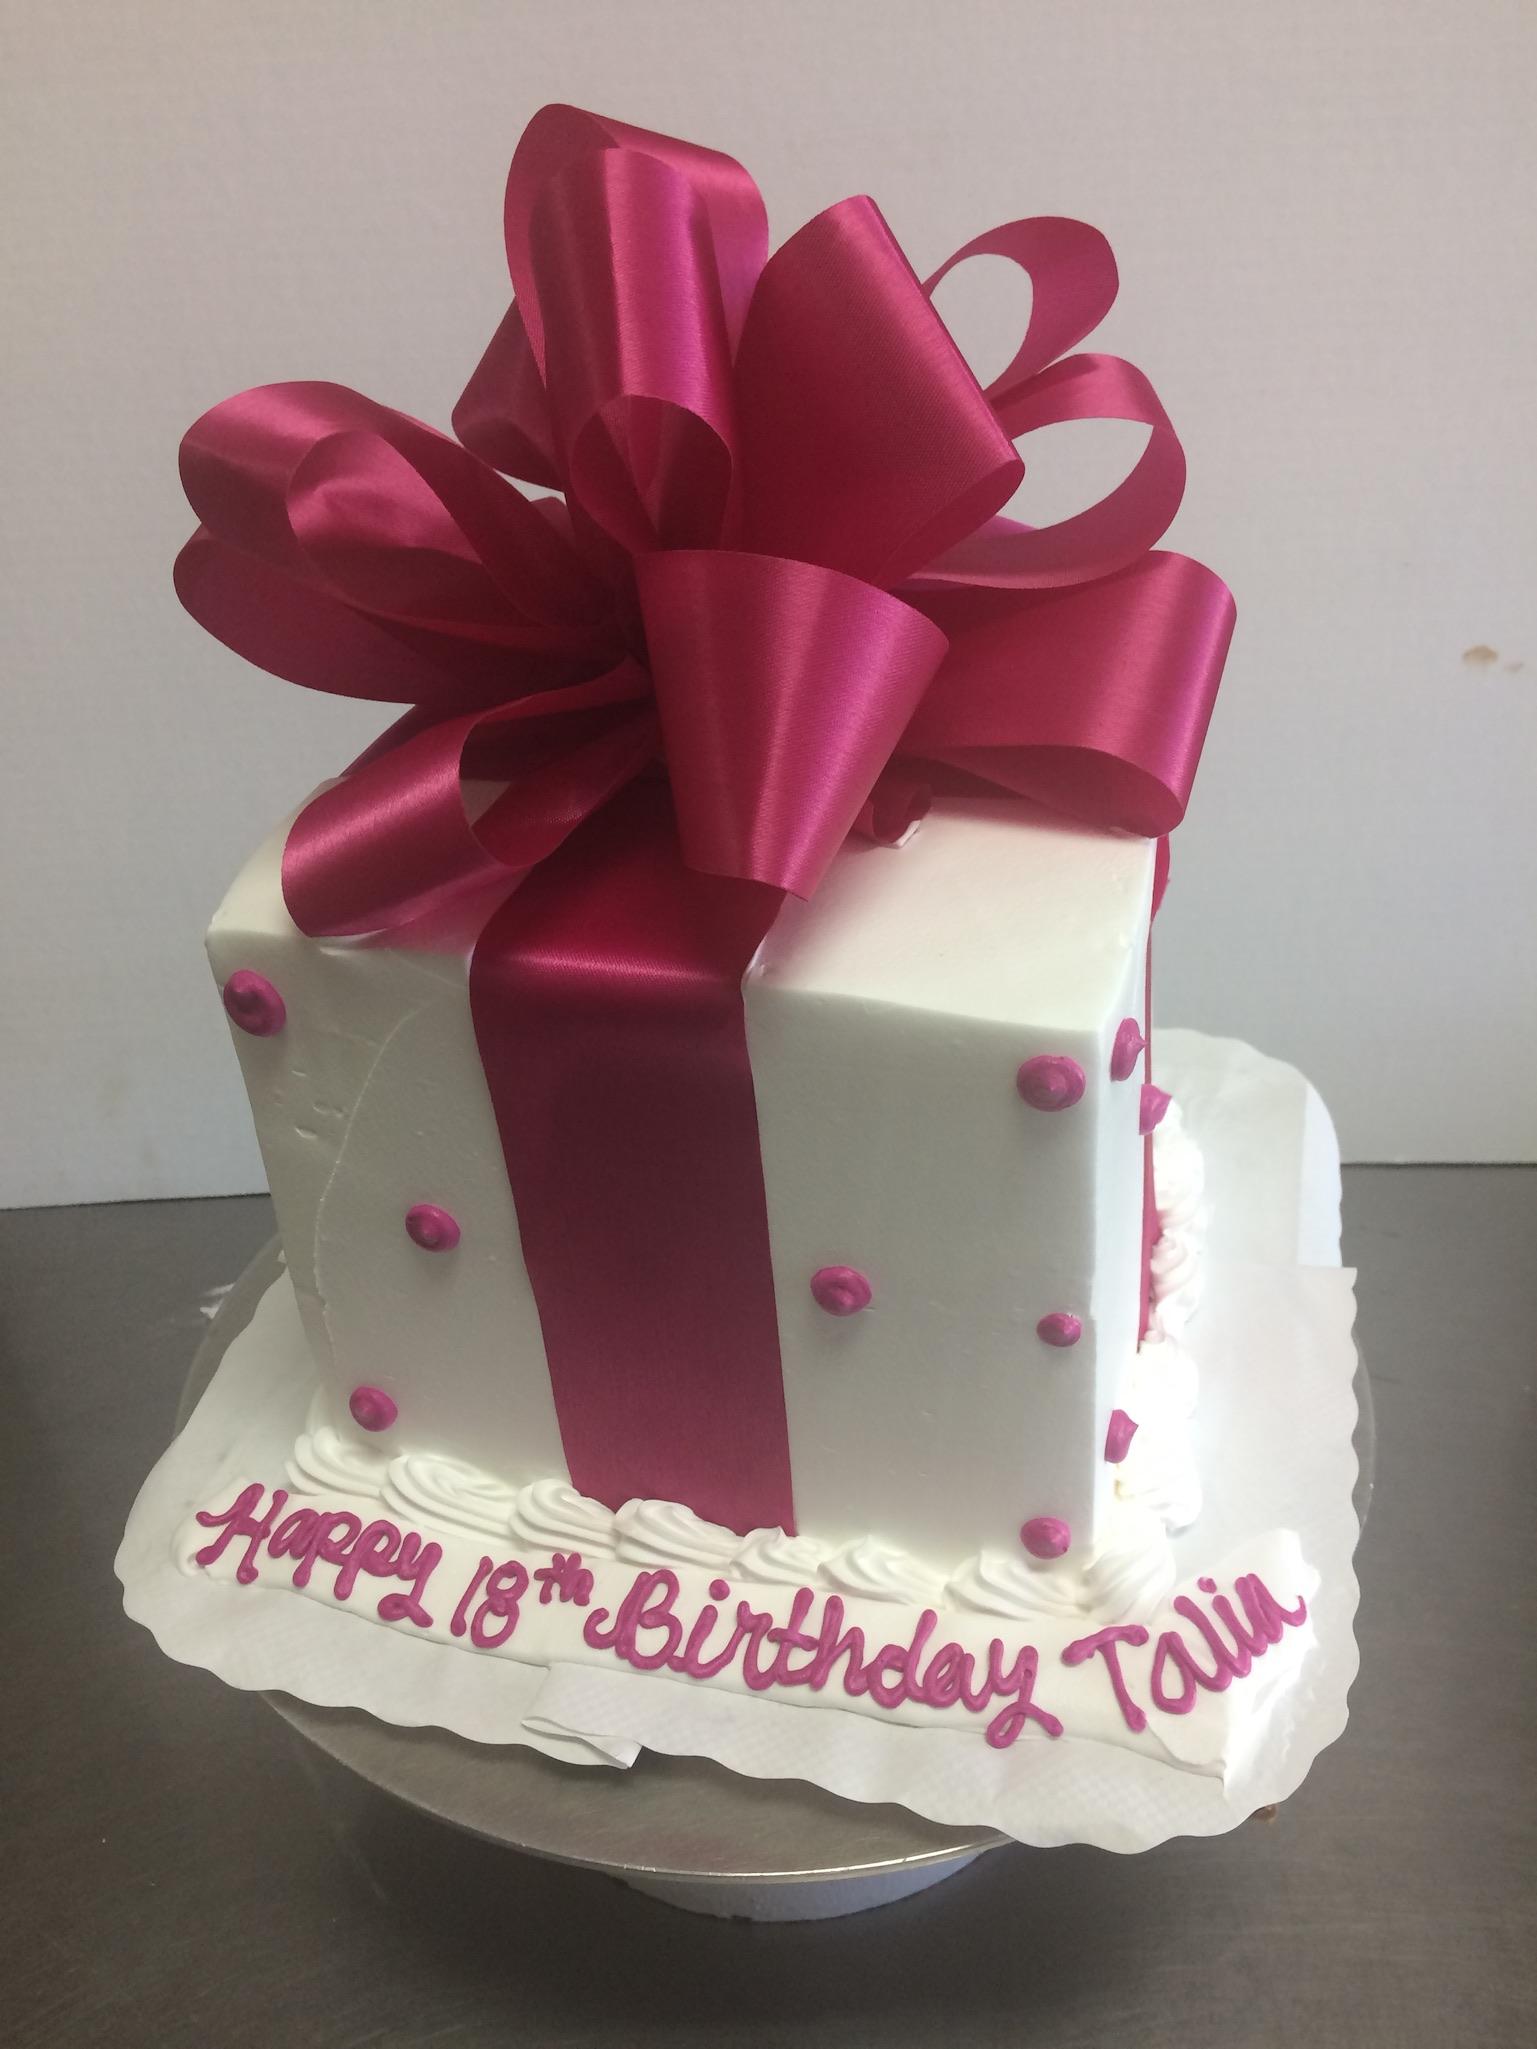 6 Square 7 Layer Cake Serves 20